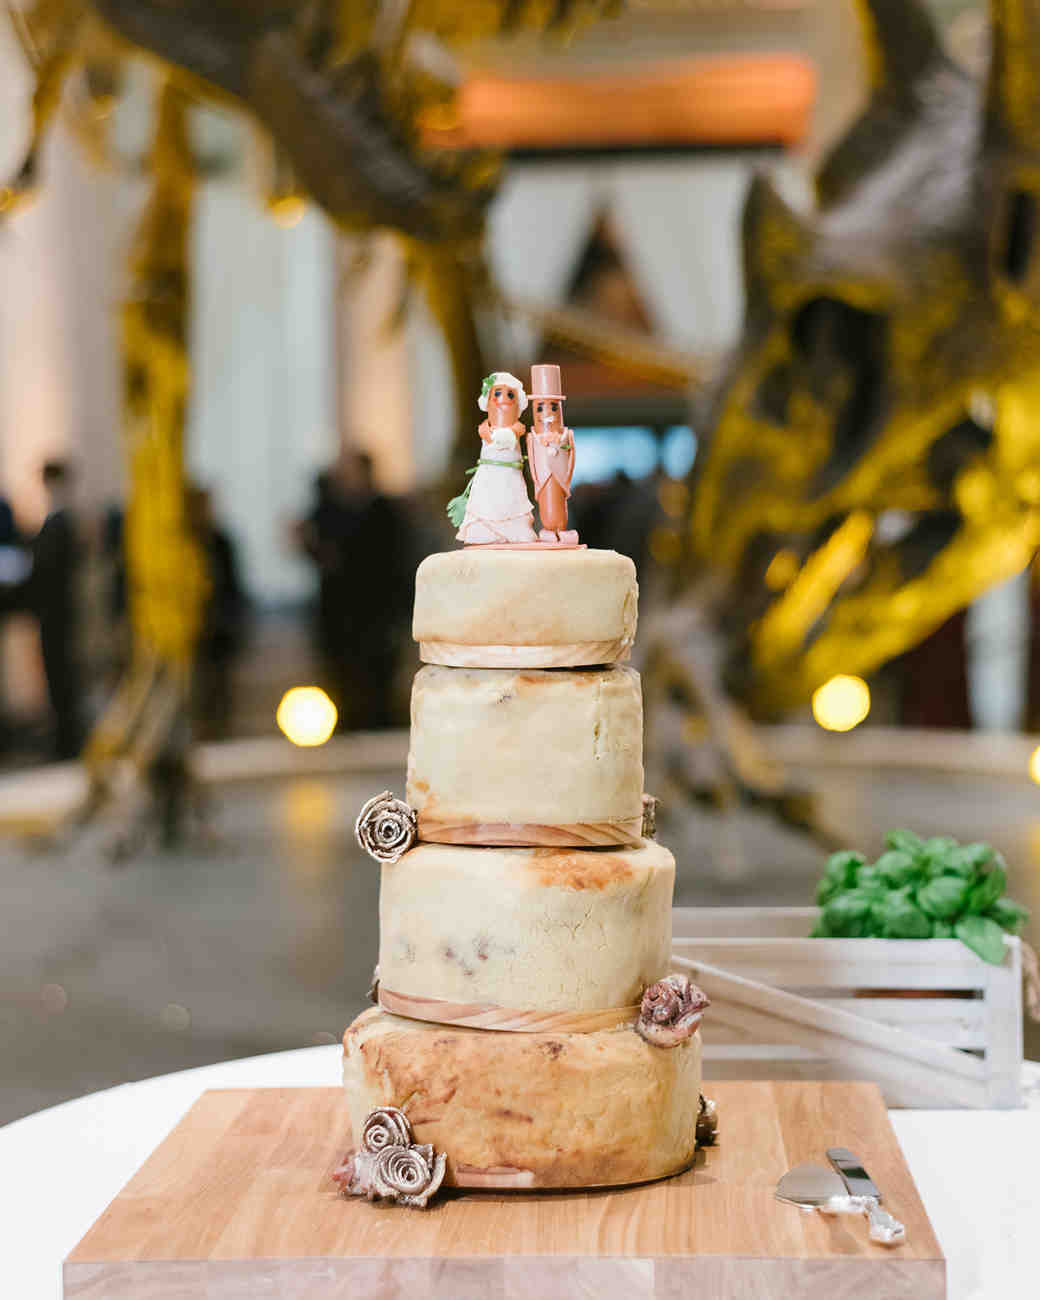 duff goldman wedding meat cake